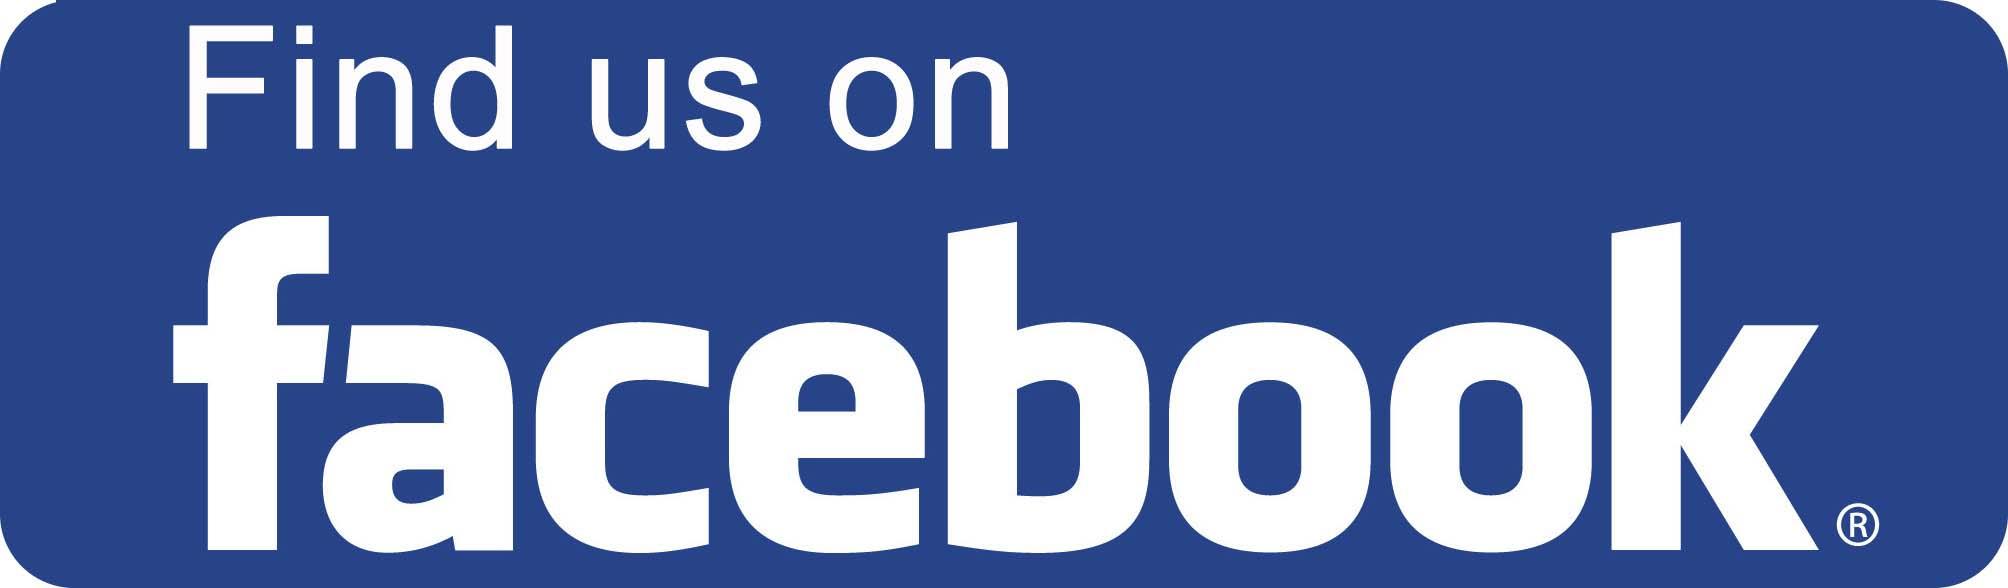 Kalkaska Public Schools - Find Us On Facebook!